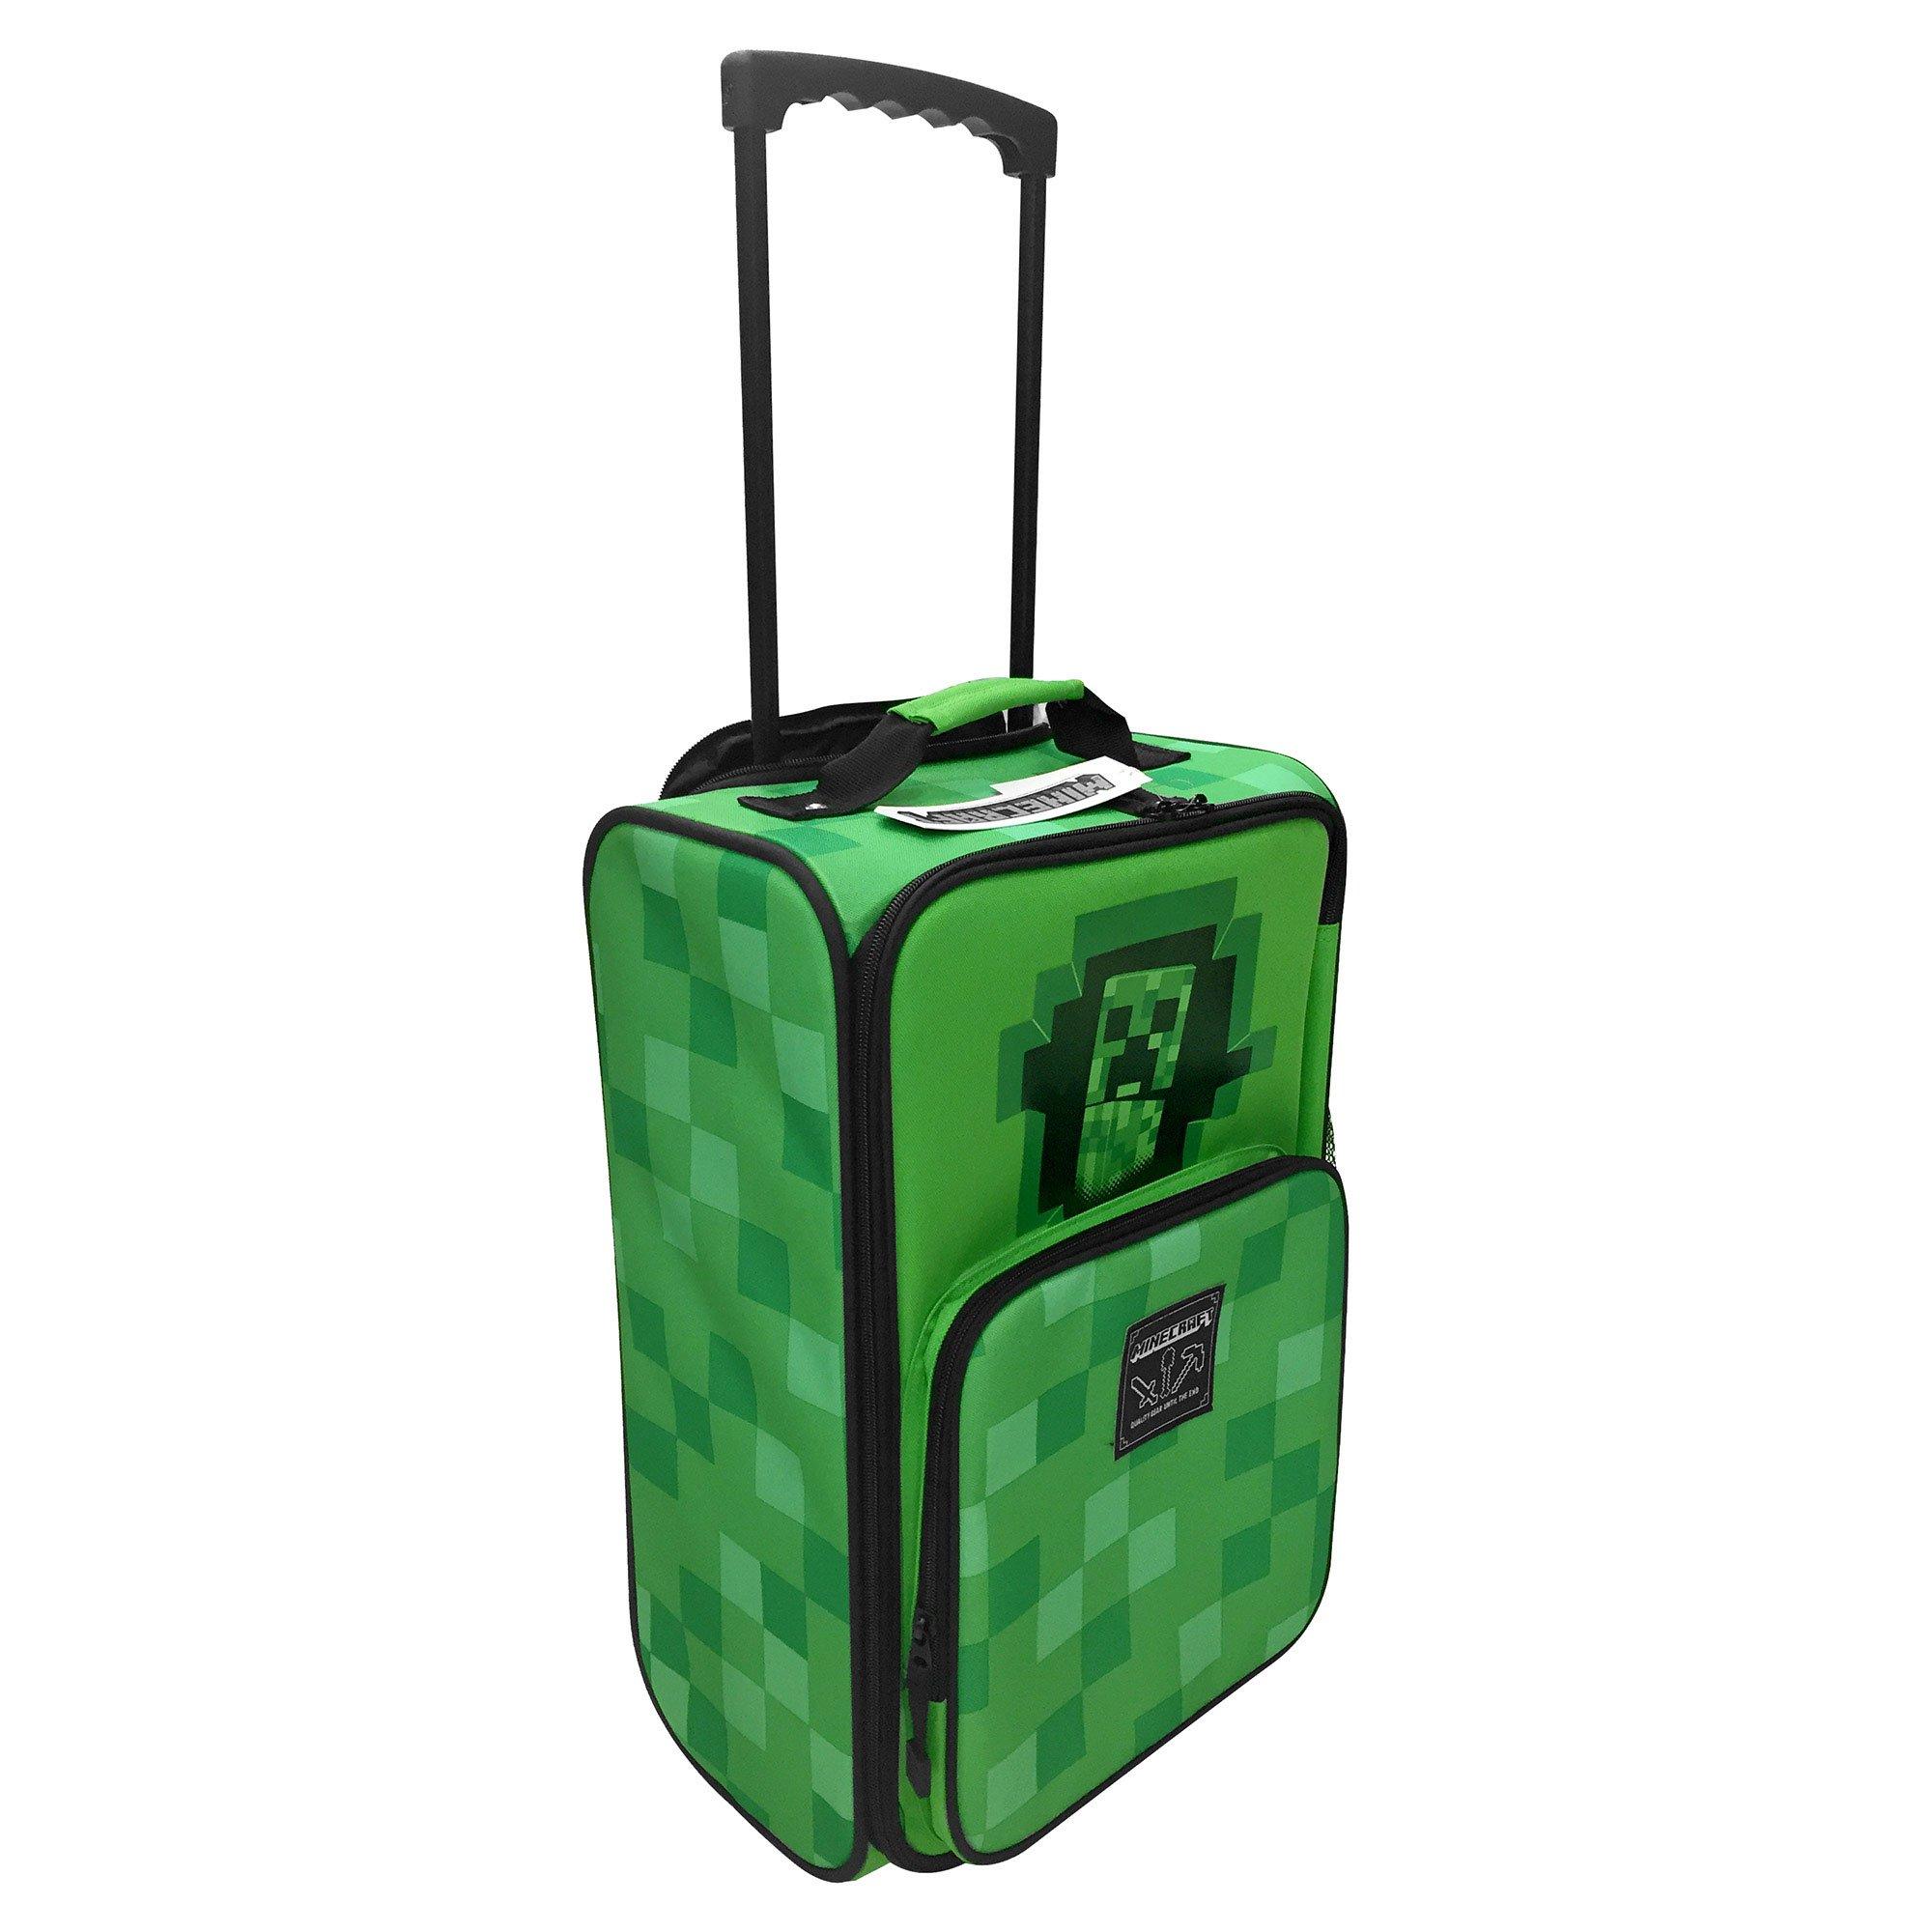 JINX Minecraft Creepy Creeper Rolling Carry On Luggage (Green, 18'')